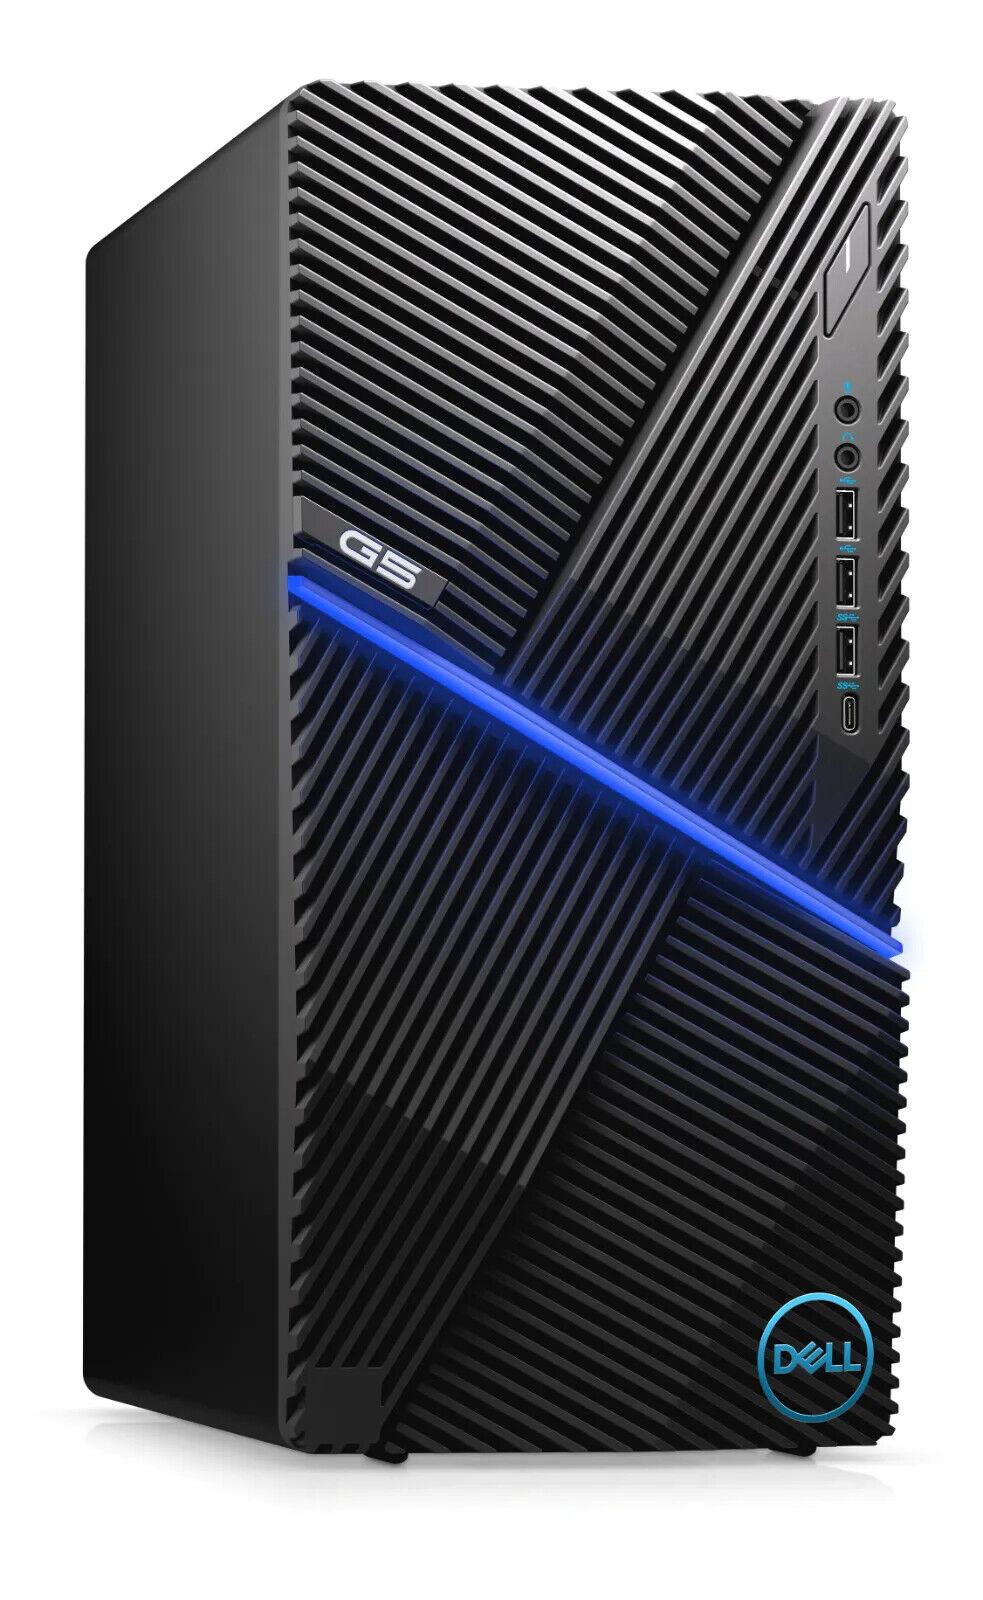 Dell G5 Gaming Desktop  i3-10100 , 8GB DDR4 RAM, 1 TB HDD No GPU Computers/Tablets & Networking